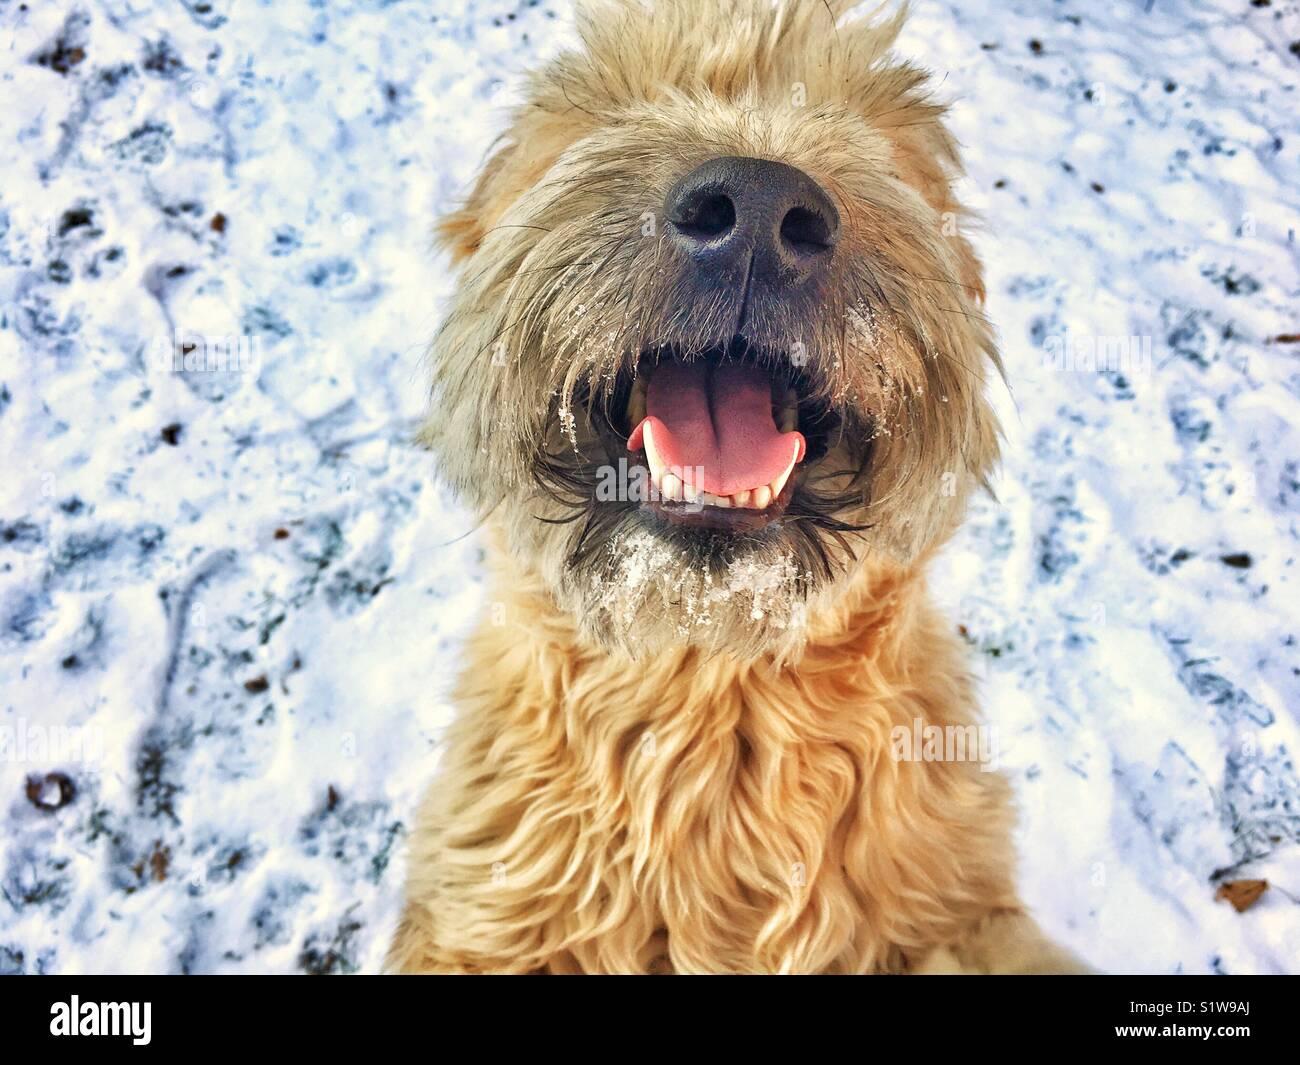 Felice di neve soffice cane Immagini Stock